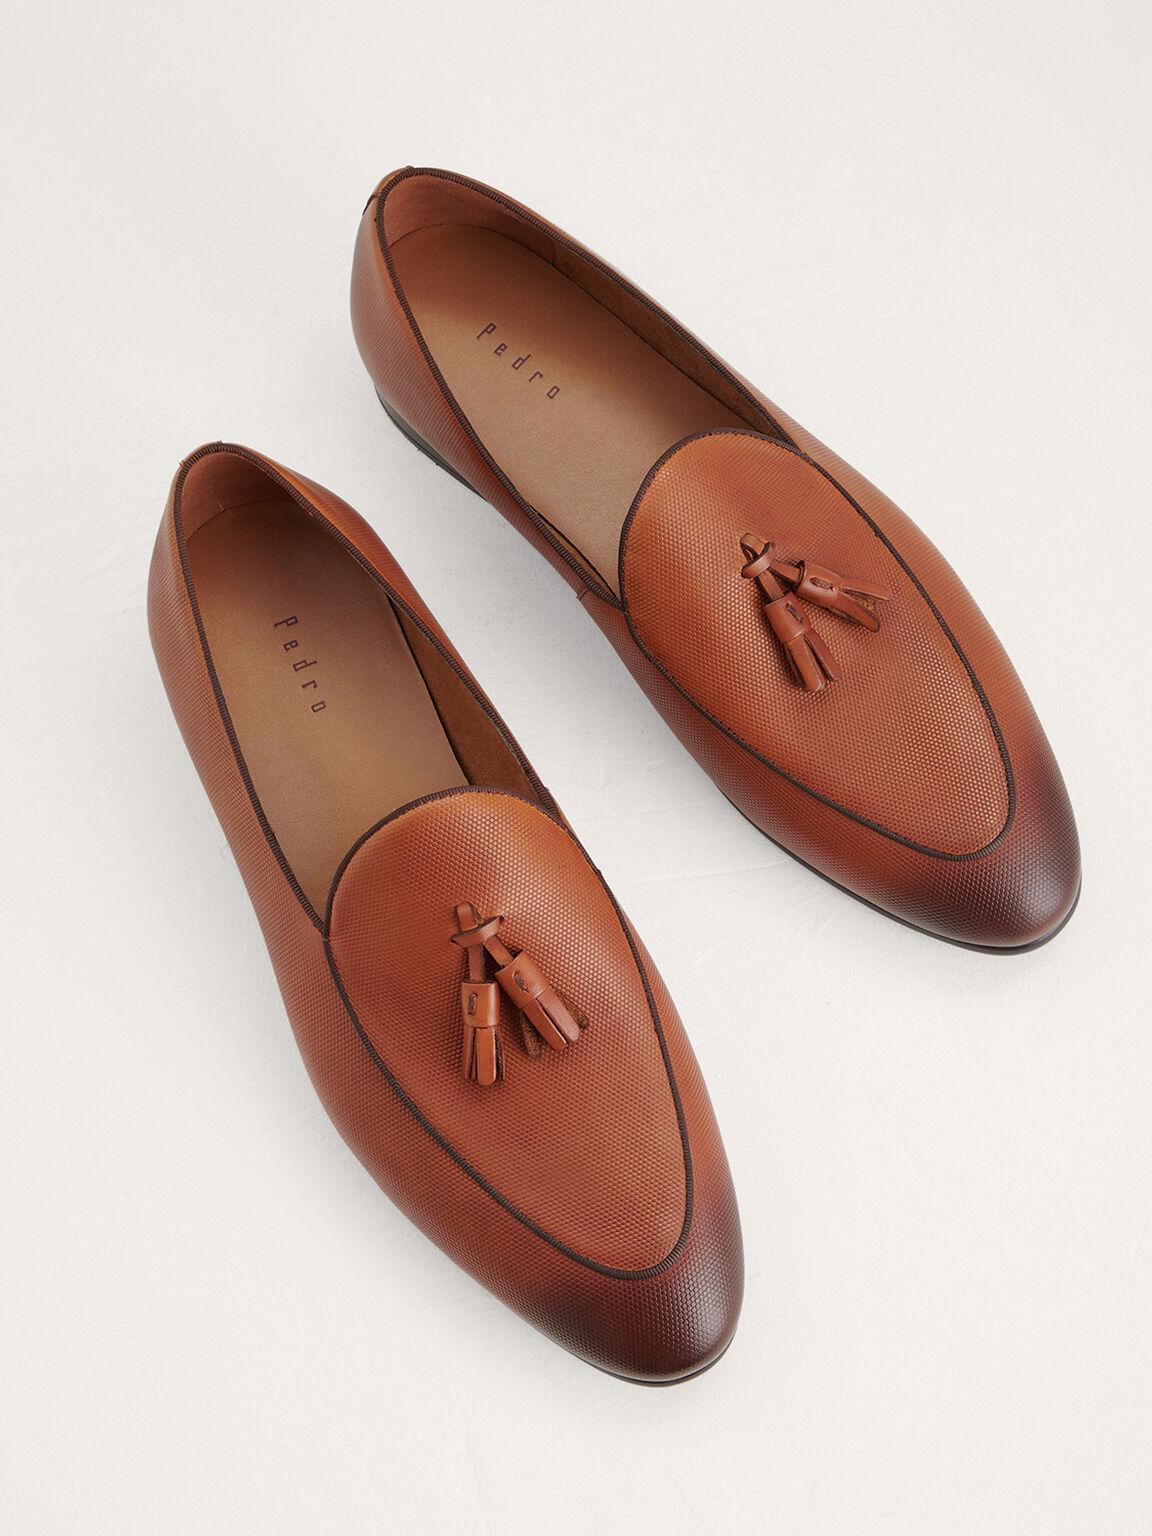 Leather Tasselled Loafers, Cognac, hi-res